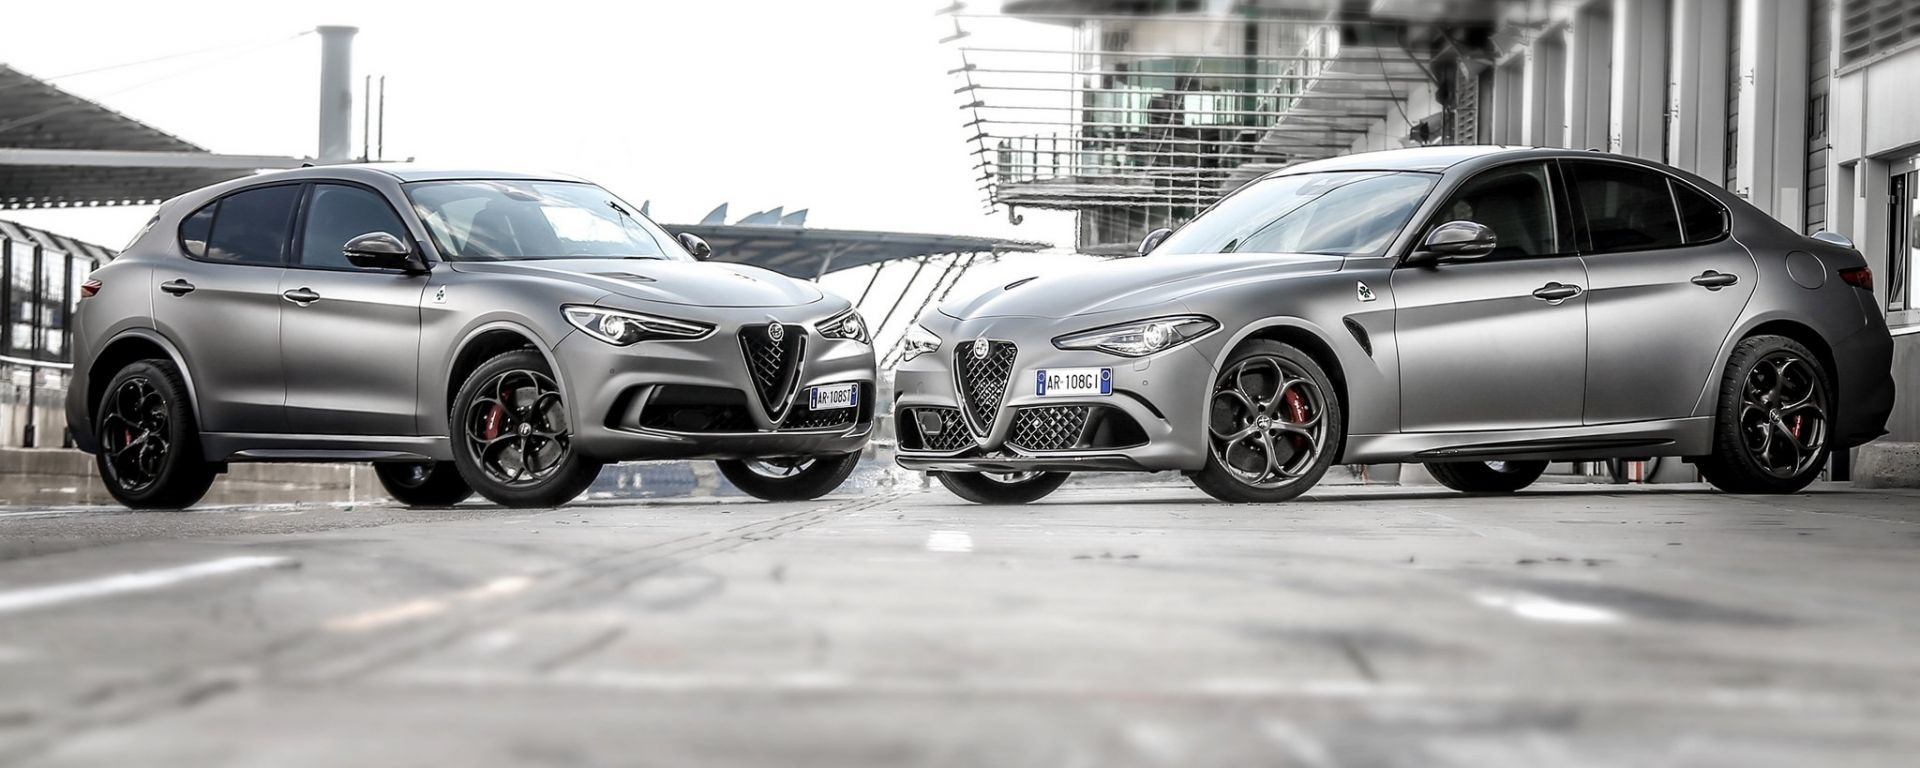 Alfa Romeo Giulia e Stelvio N-Ring